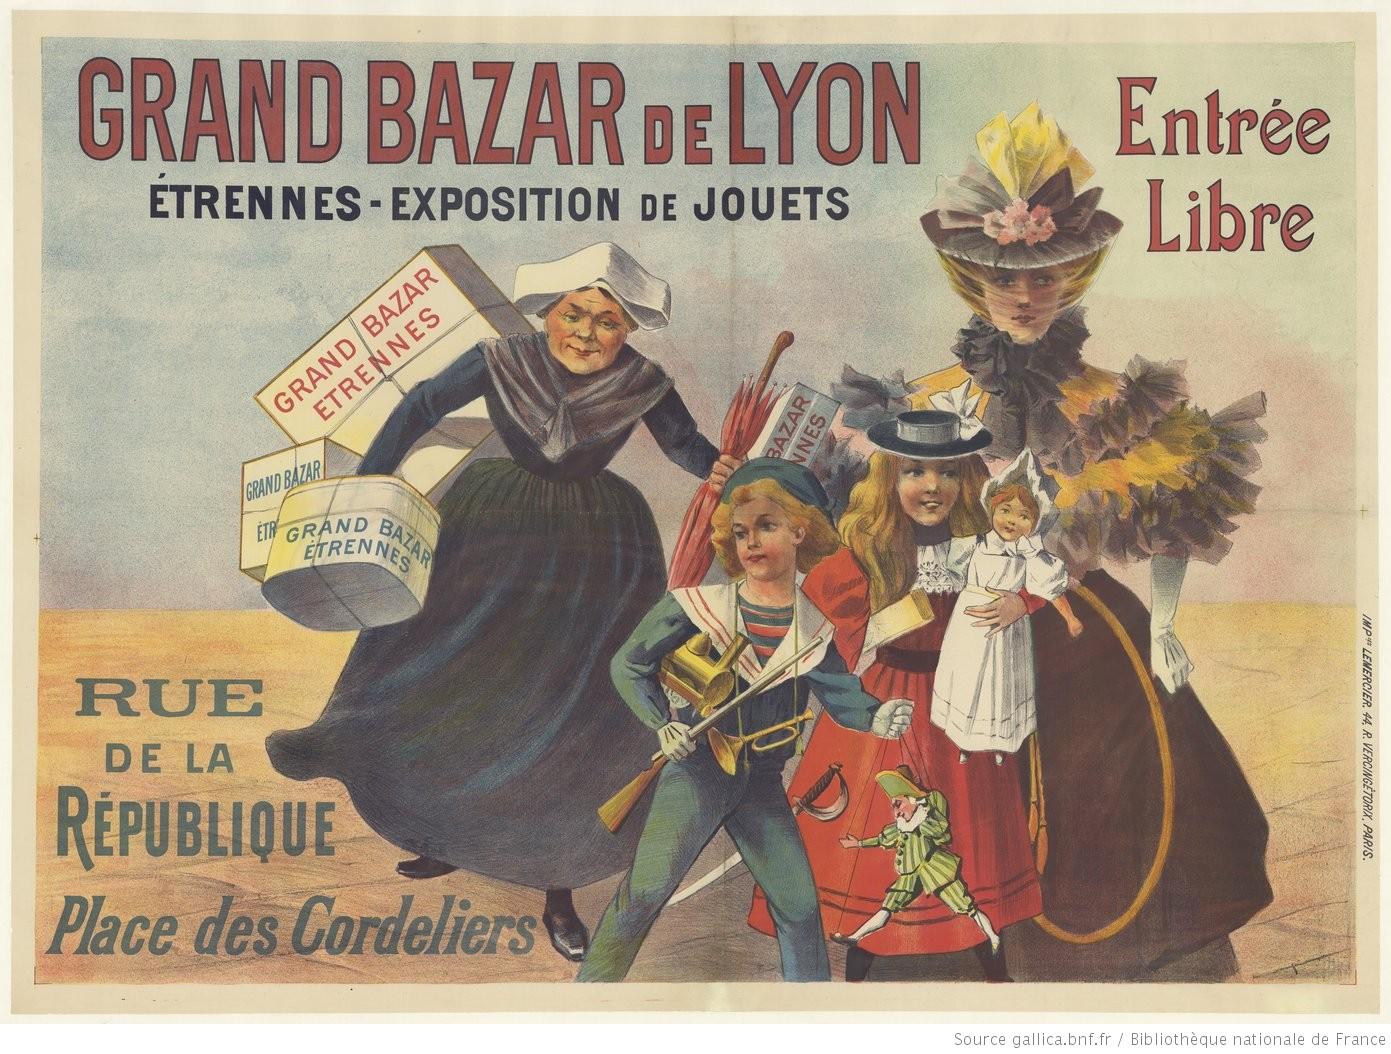 Grand_Bazar_de_Lyon_Etrennes_[...]_btv1b53127604k